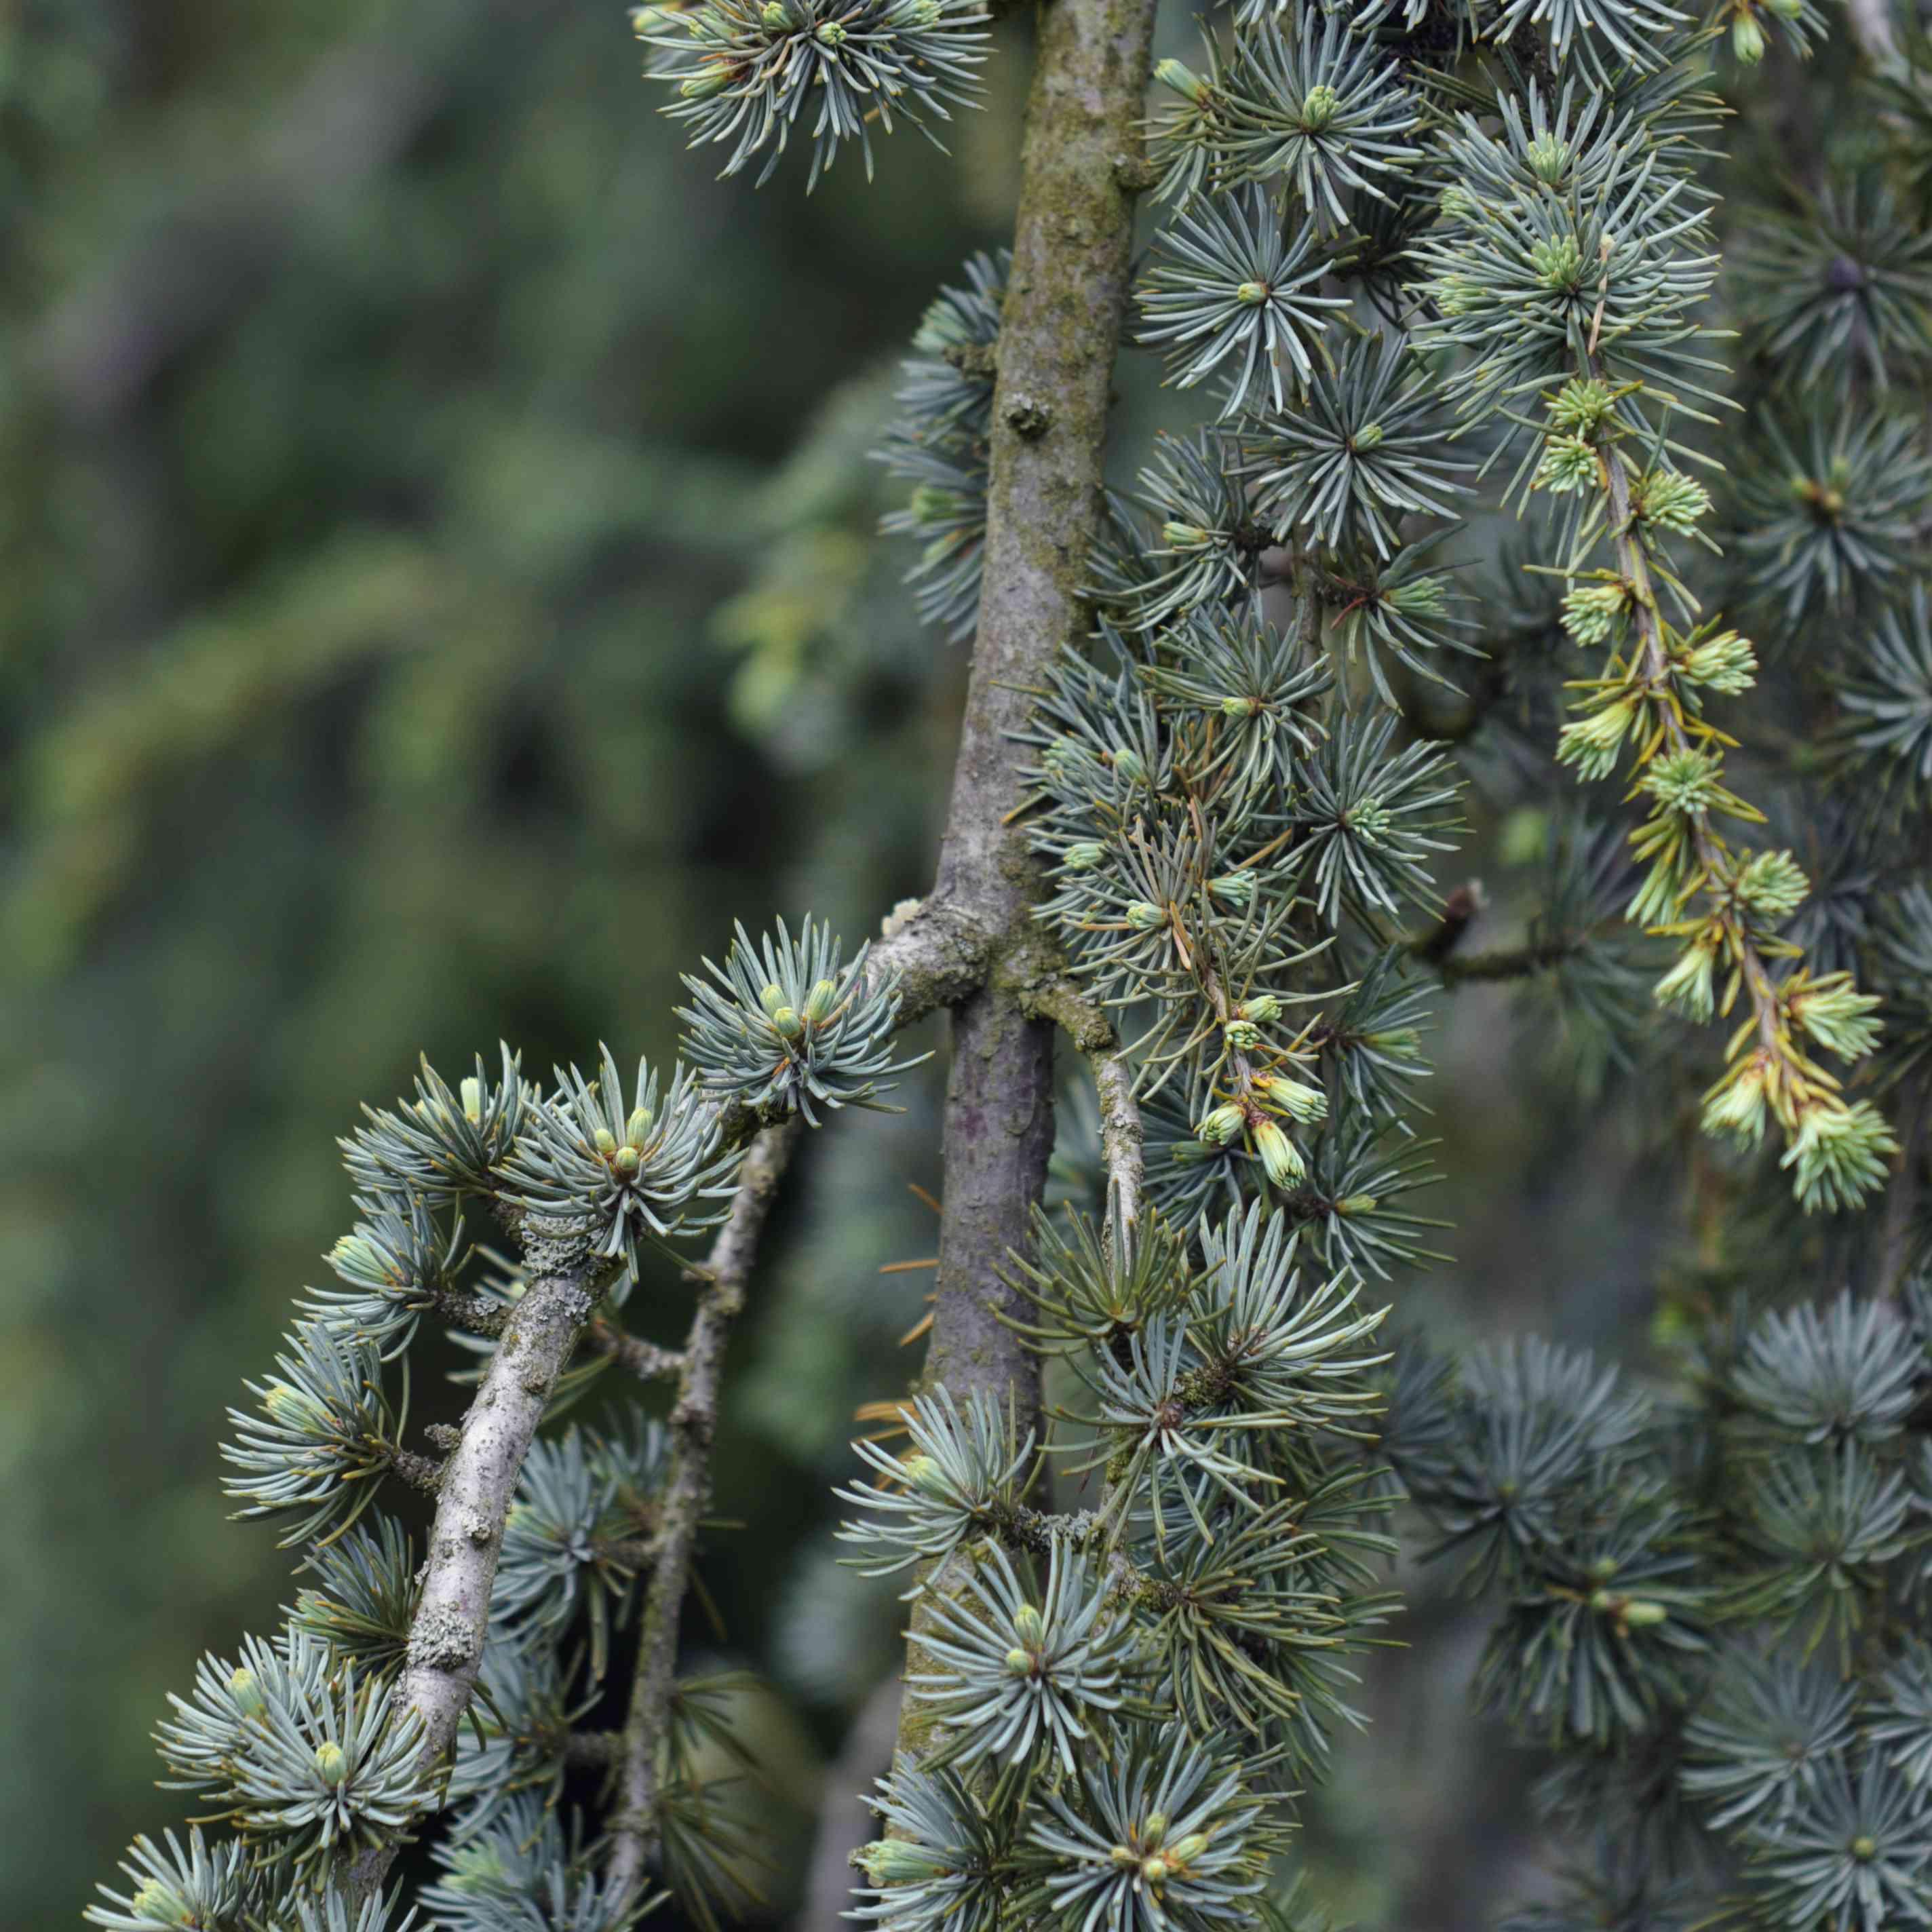 Blue atlas cedar with whorls and buds of evergreen needles closeup